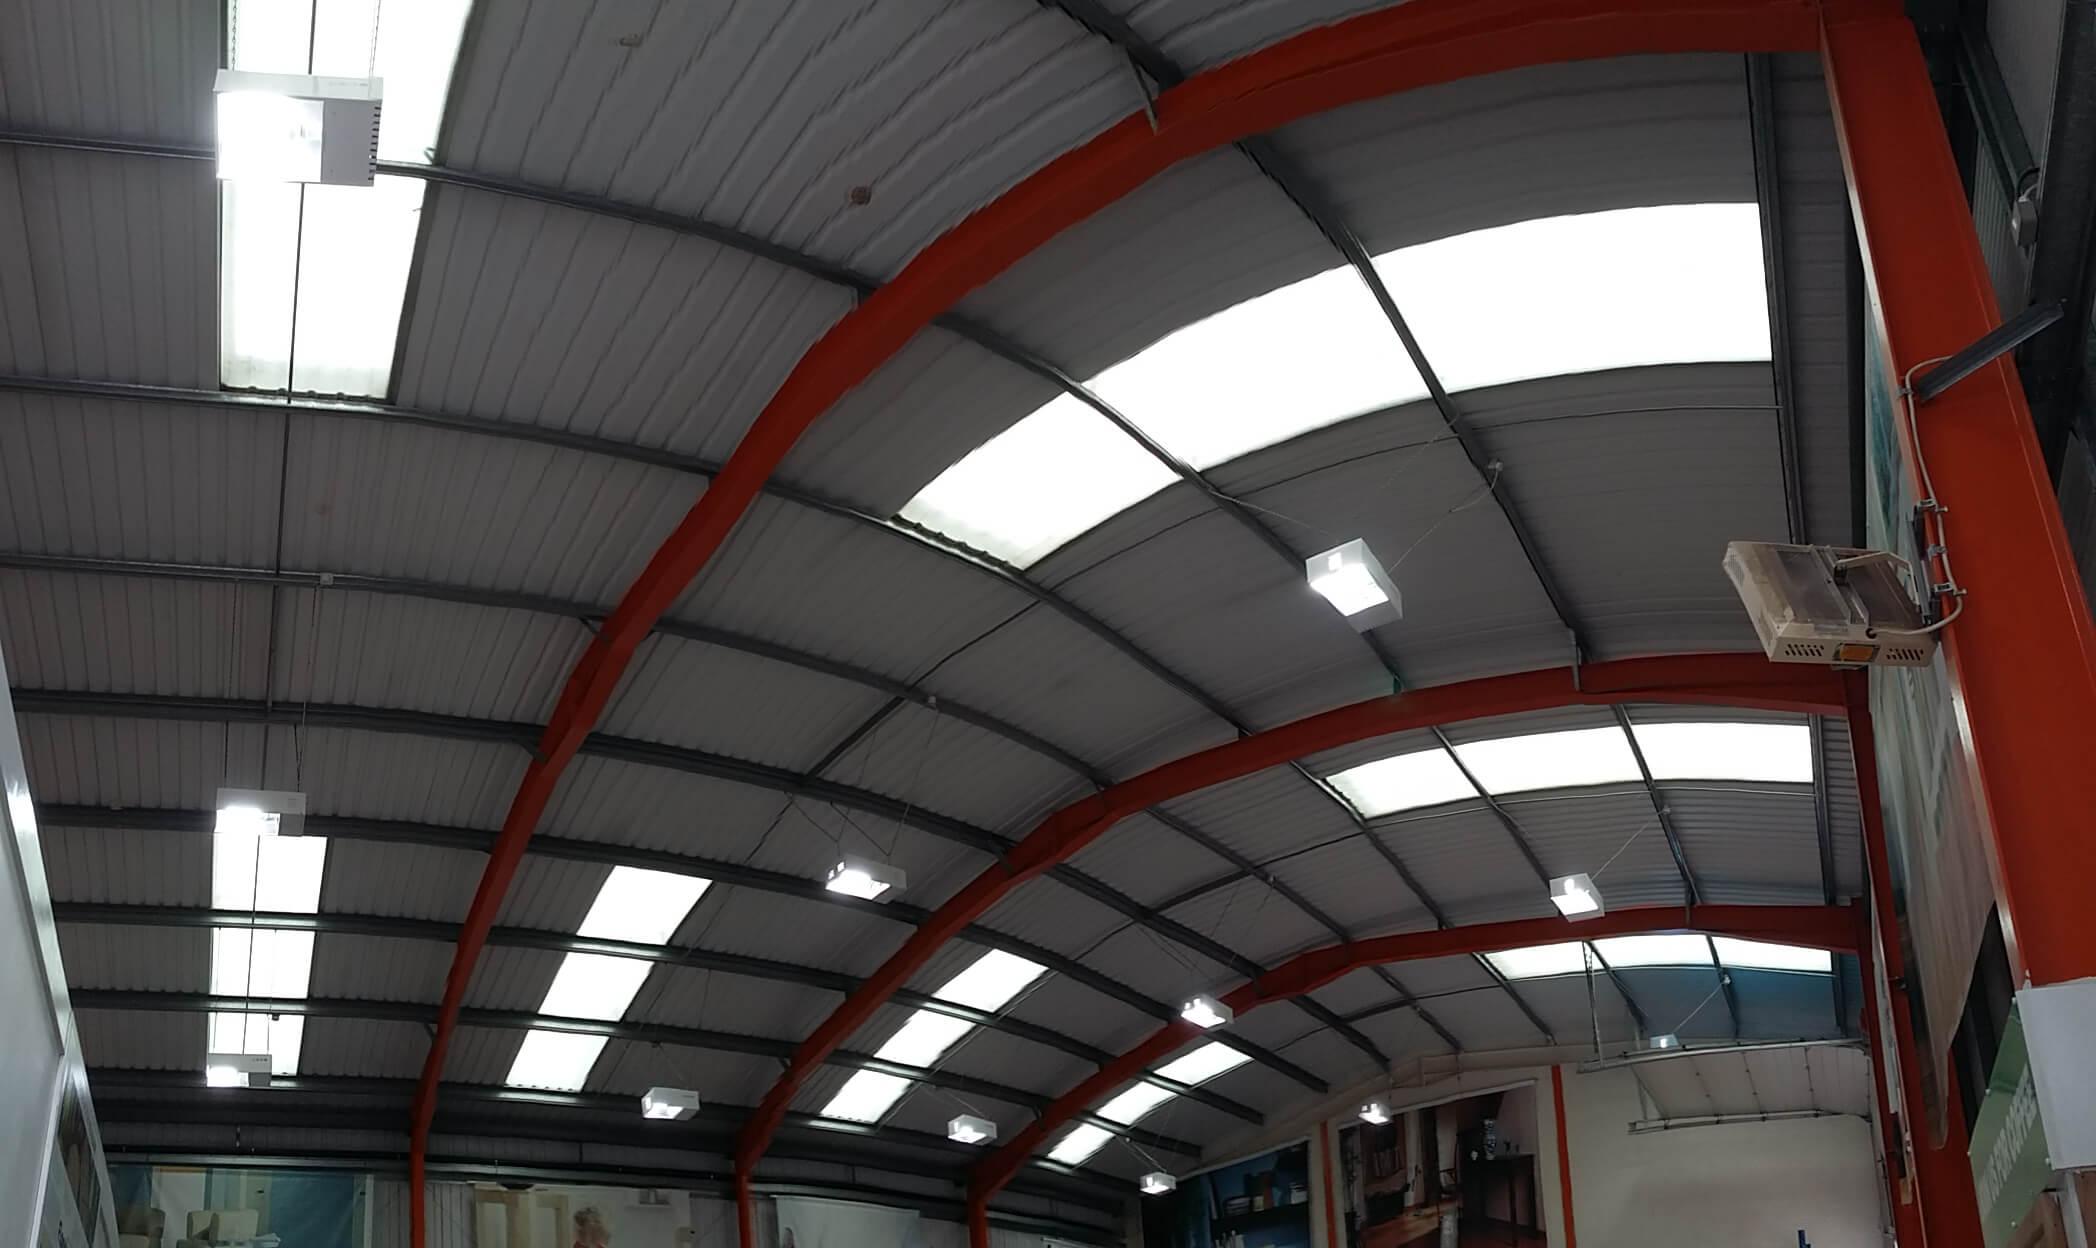 Basildon Essex electrical contractor installs LED lighting